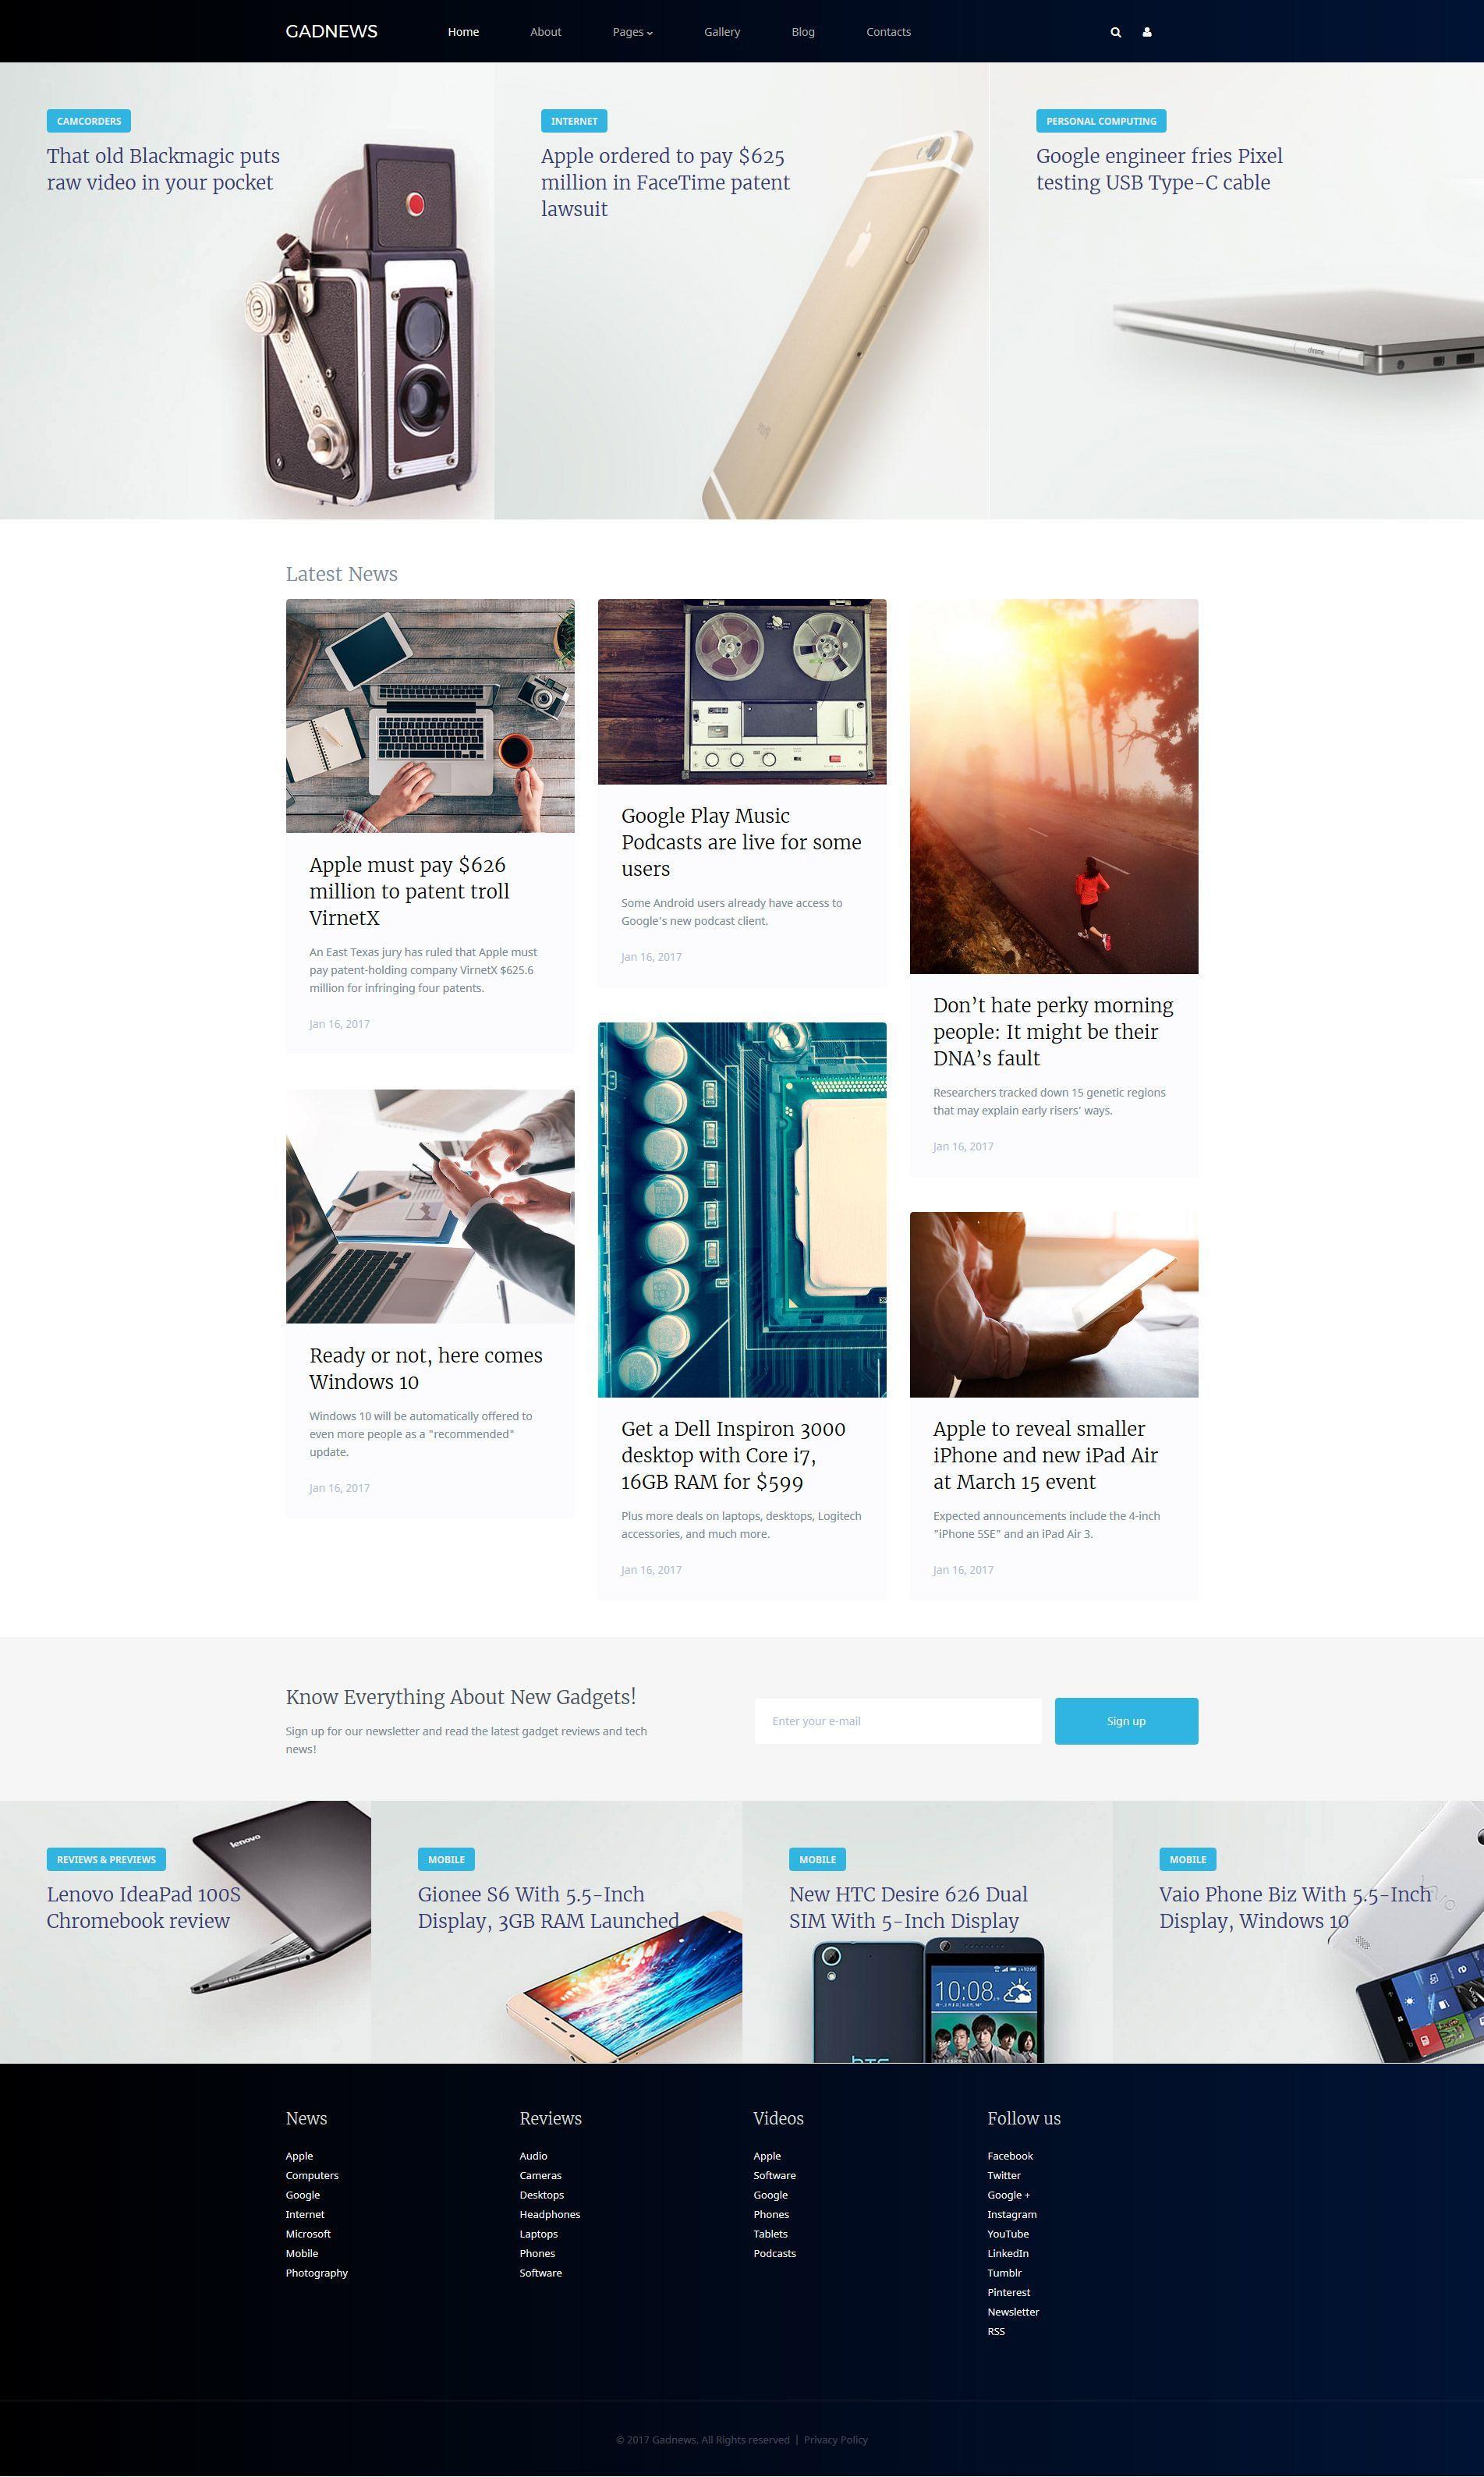 Gadgets Electronics Review Joomla Template Joomla Templates Ideas Of Joomla Templates Joomlatemplates Electron Joomla Templates Joomla Joomla Themes